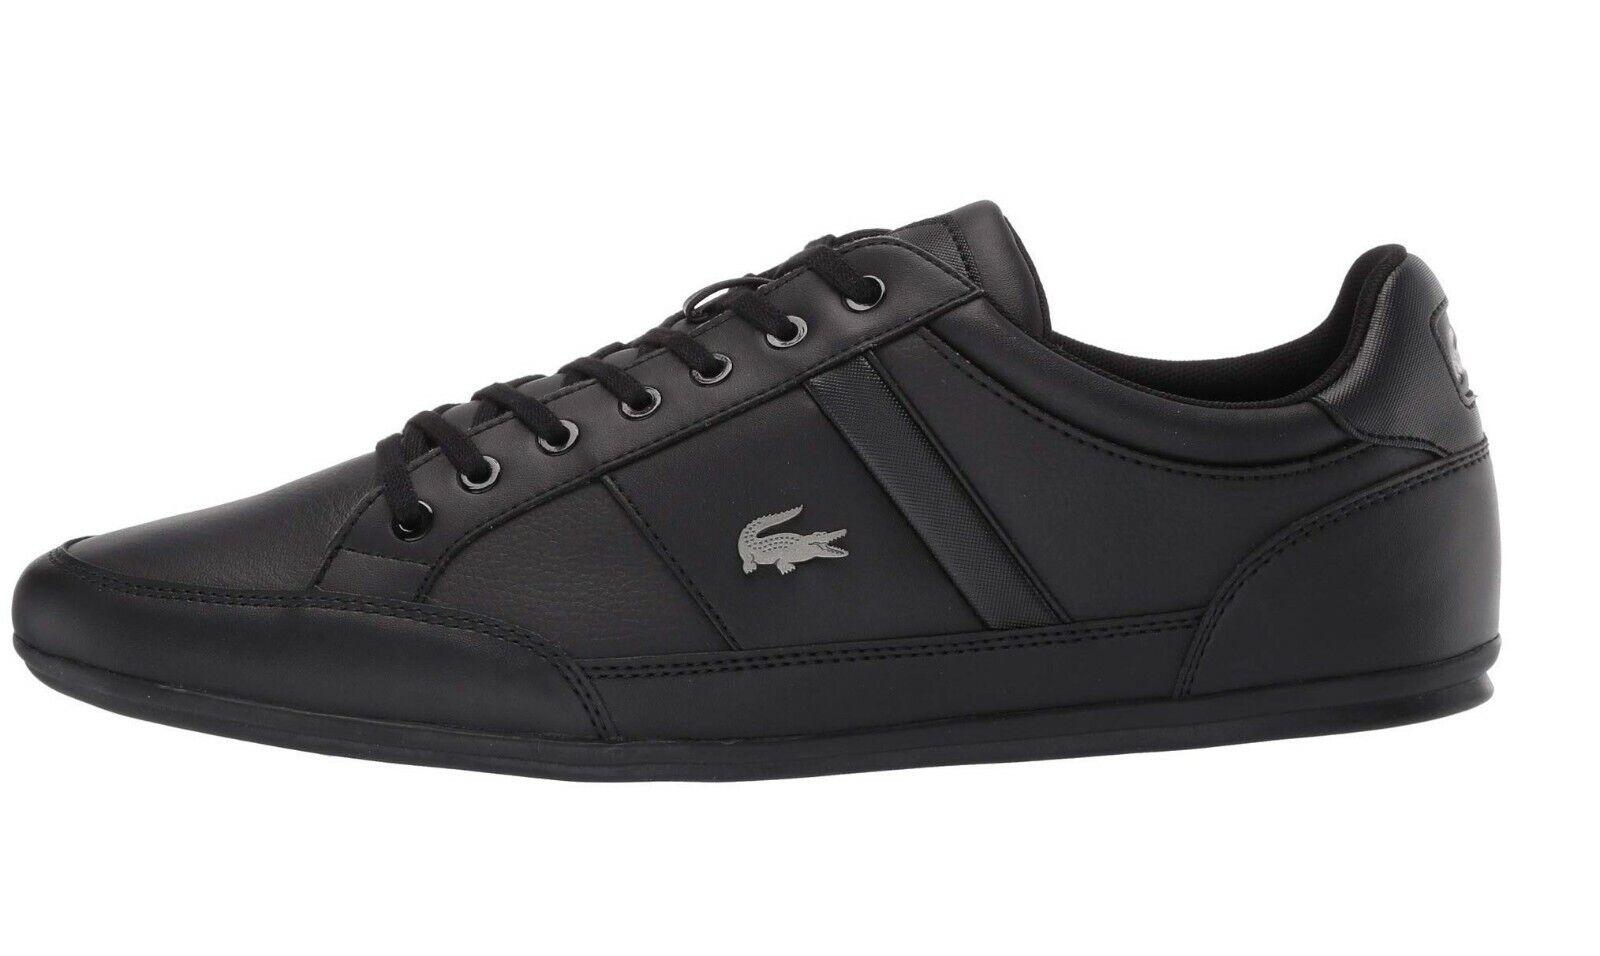 LACOSTE Chaymon BL Black Croc Logo Leather Shoes Men's Fashion Sneakers